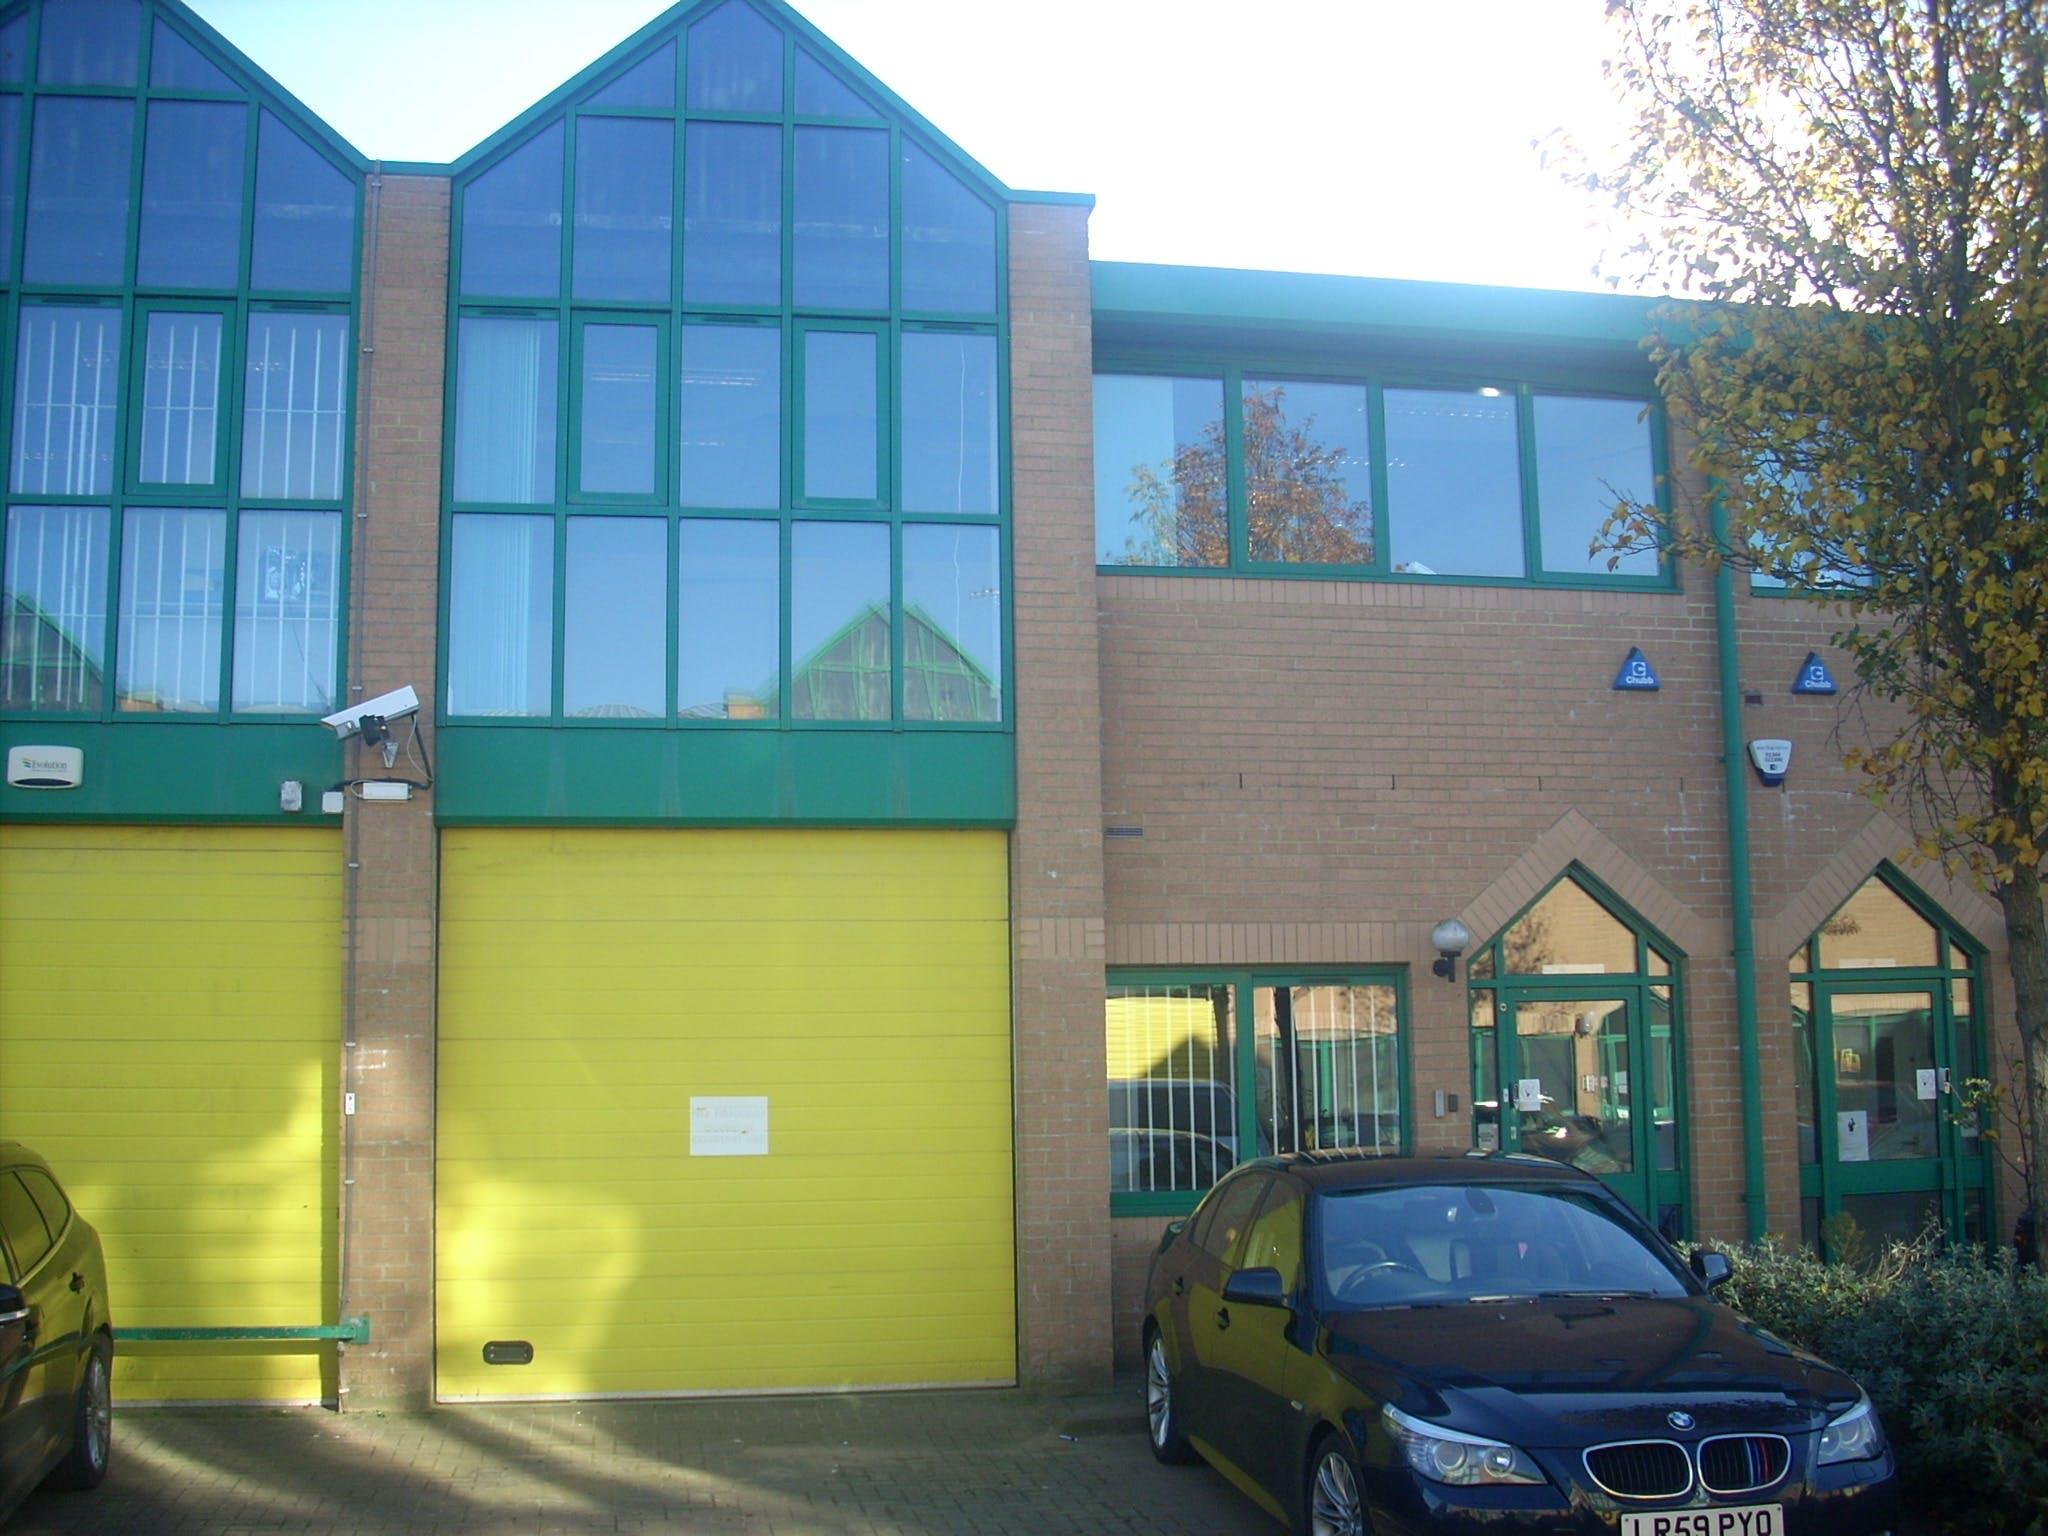 Unit 3, Brickfields Industrial Park, Kiln Lane, Bracknell, Industrial To Let - DSCN5628.JPG